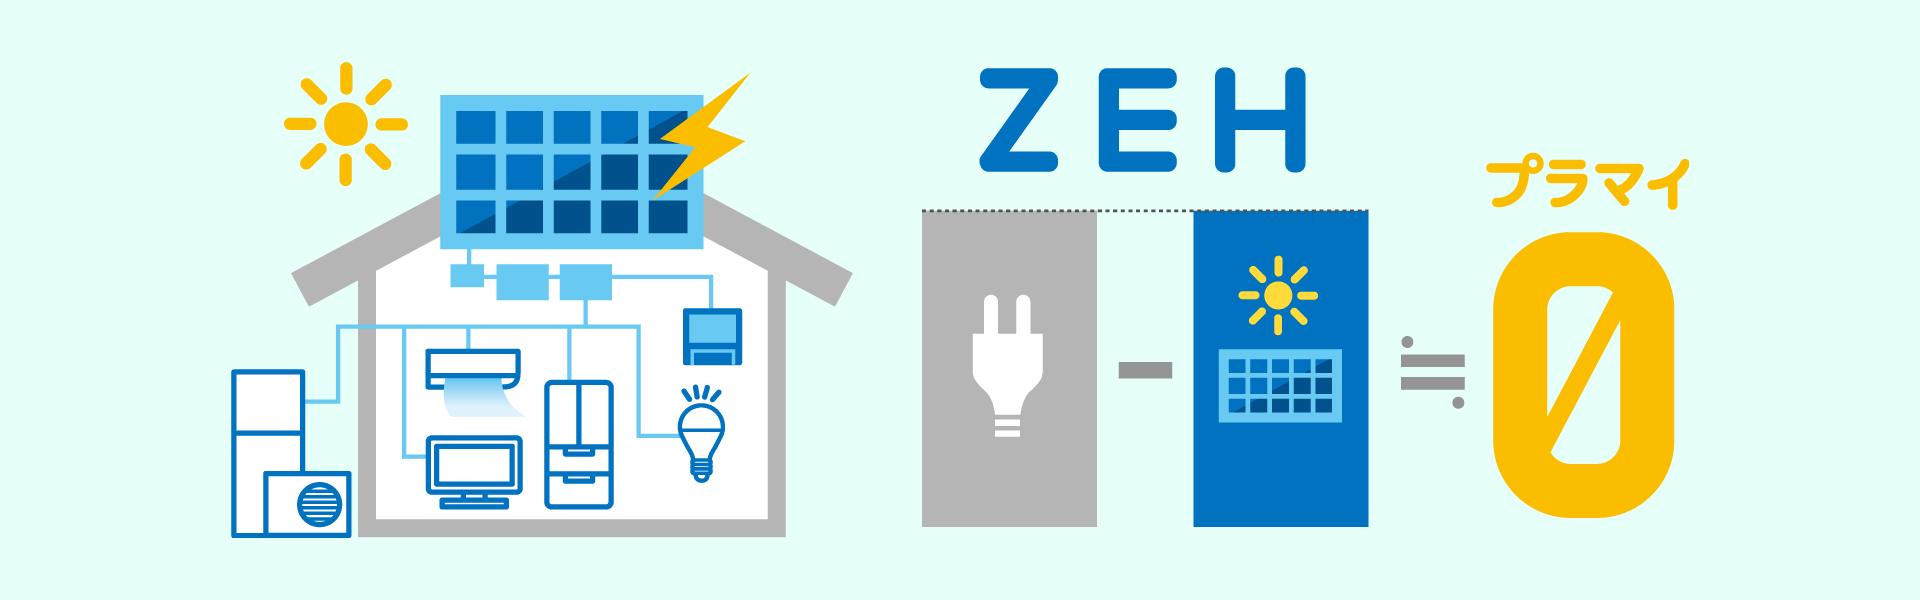 ZEH(ゼッチ)について